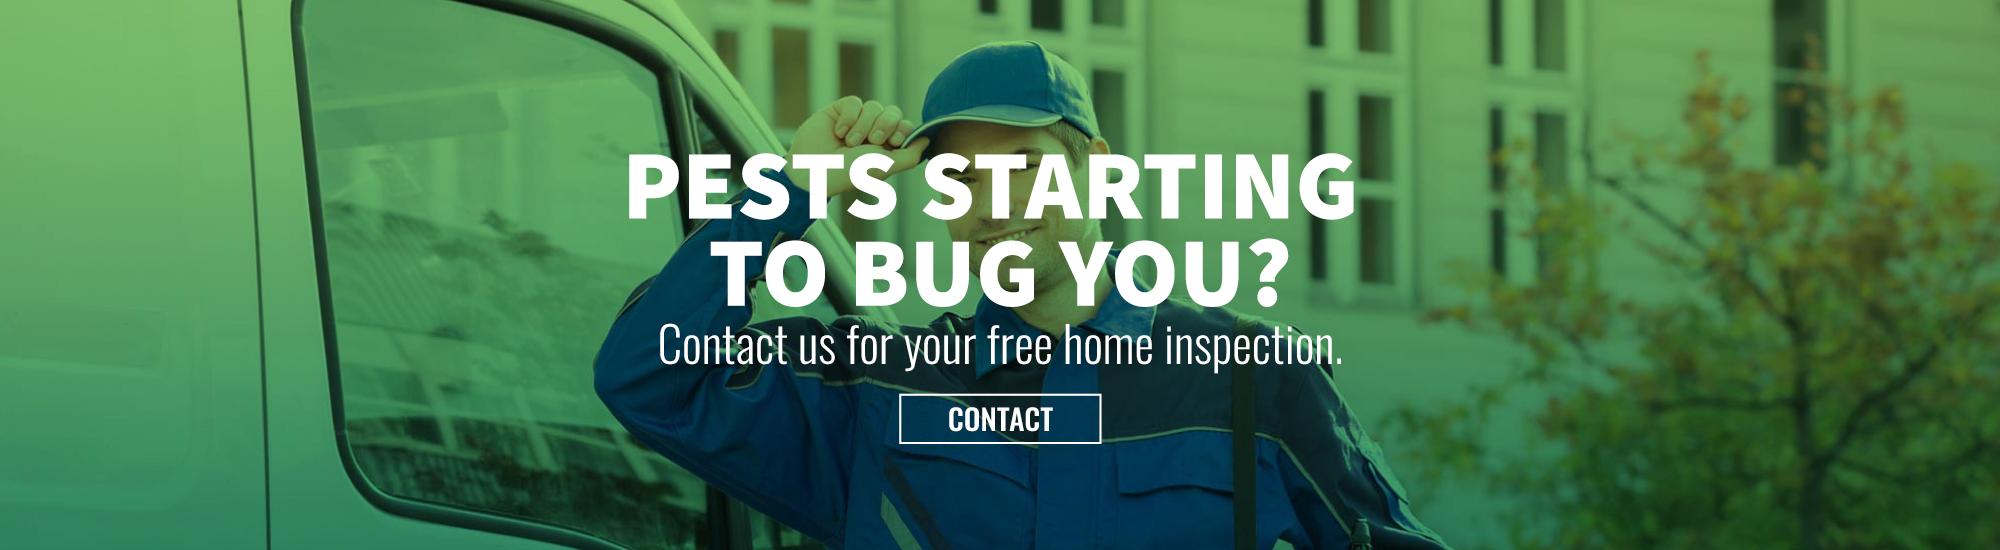 Green Piper Pest Control - Grande Prairie Homepage Banner 1